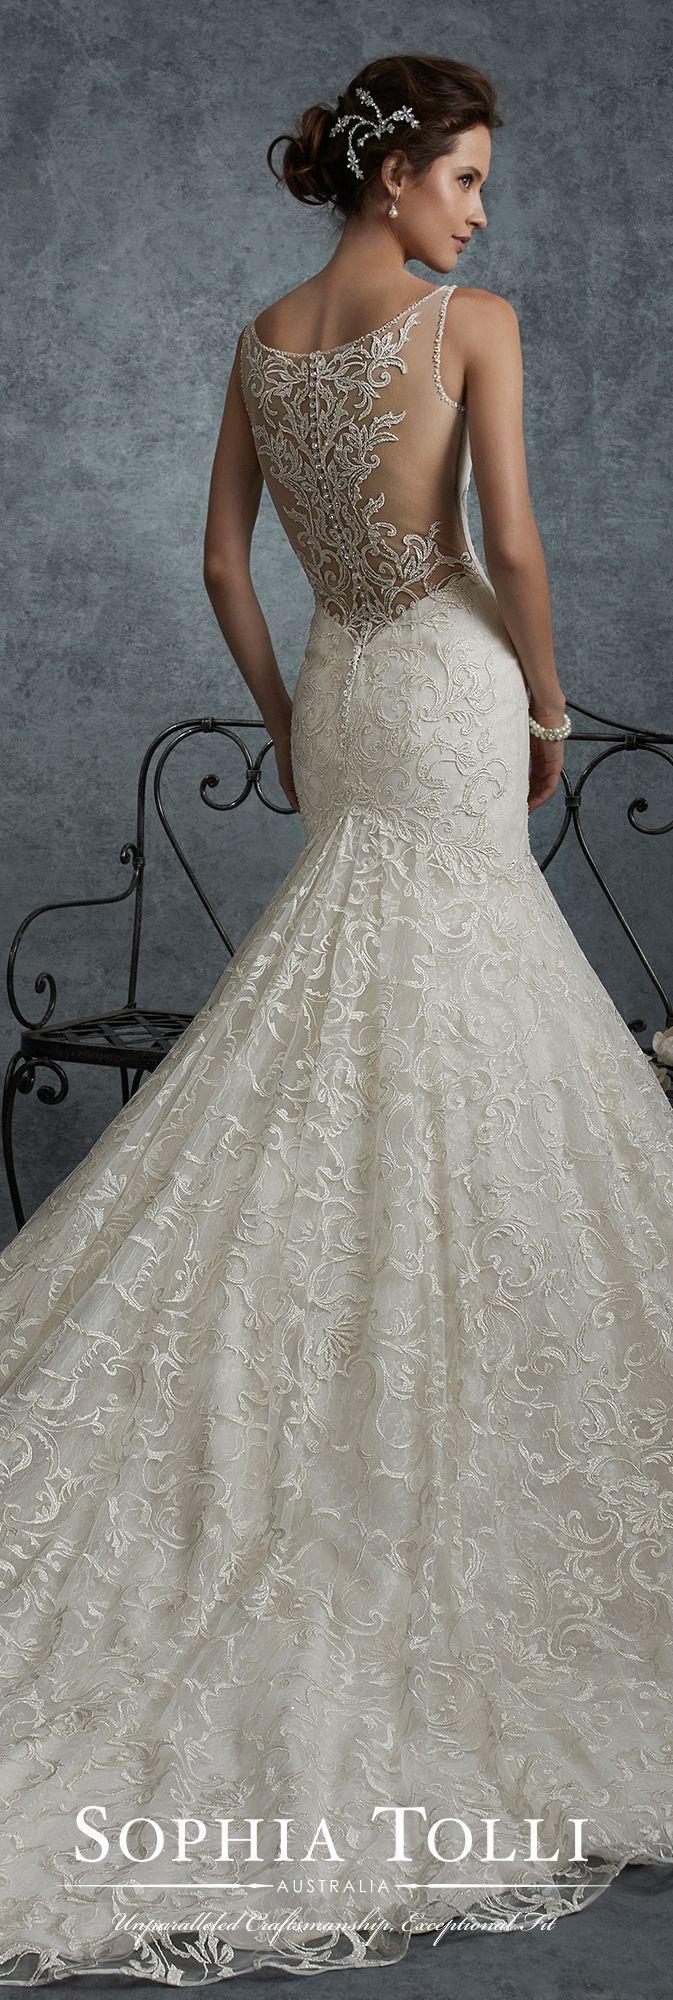 Mariage - Lace Illusion Back Trumpet Wedding Dress - Sophia Tolli Y21740